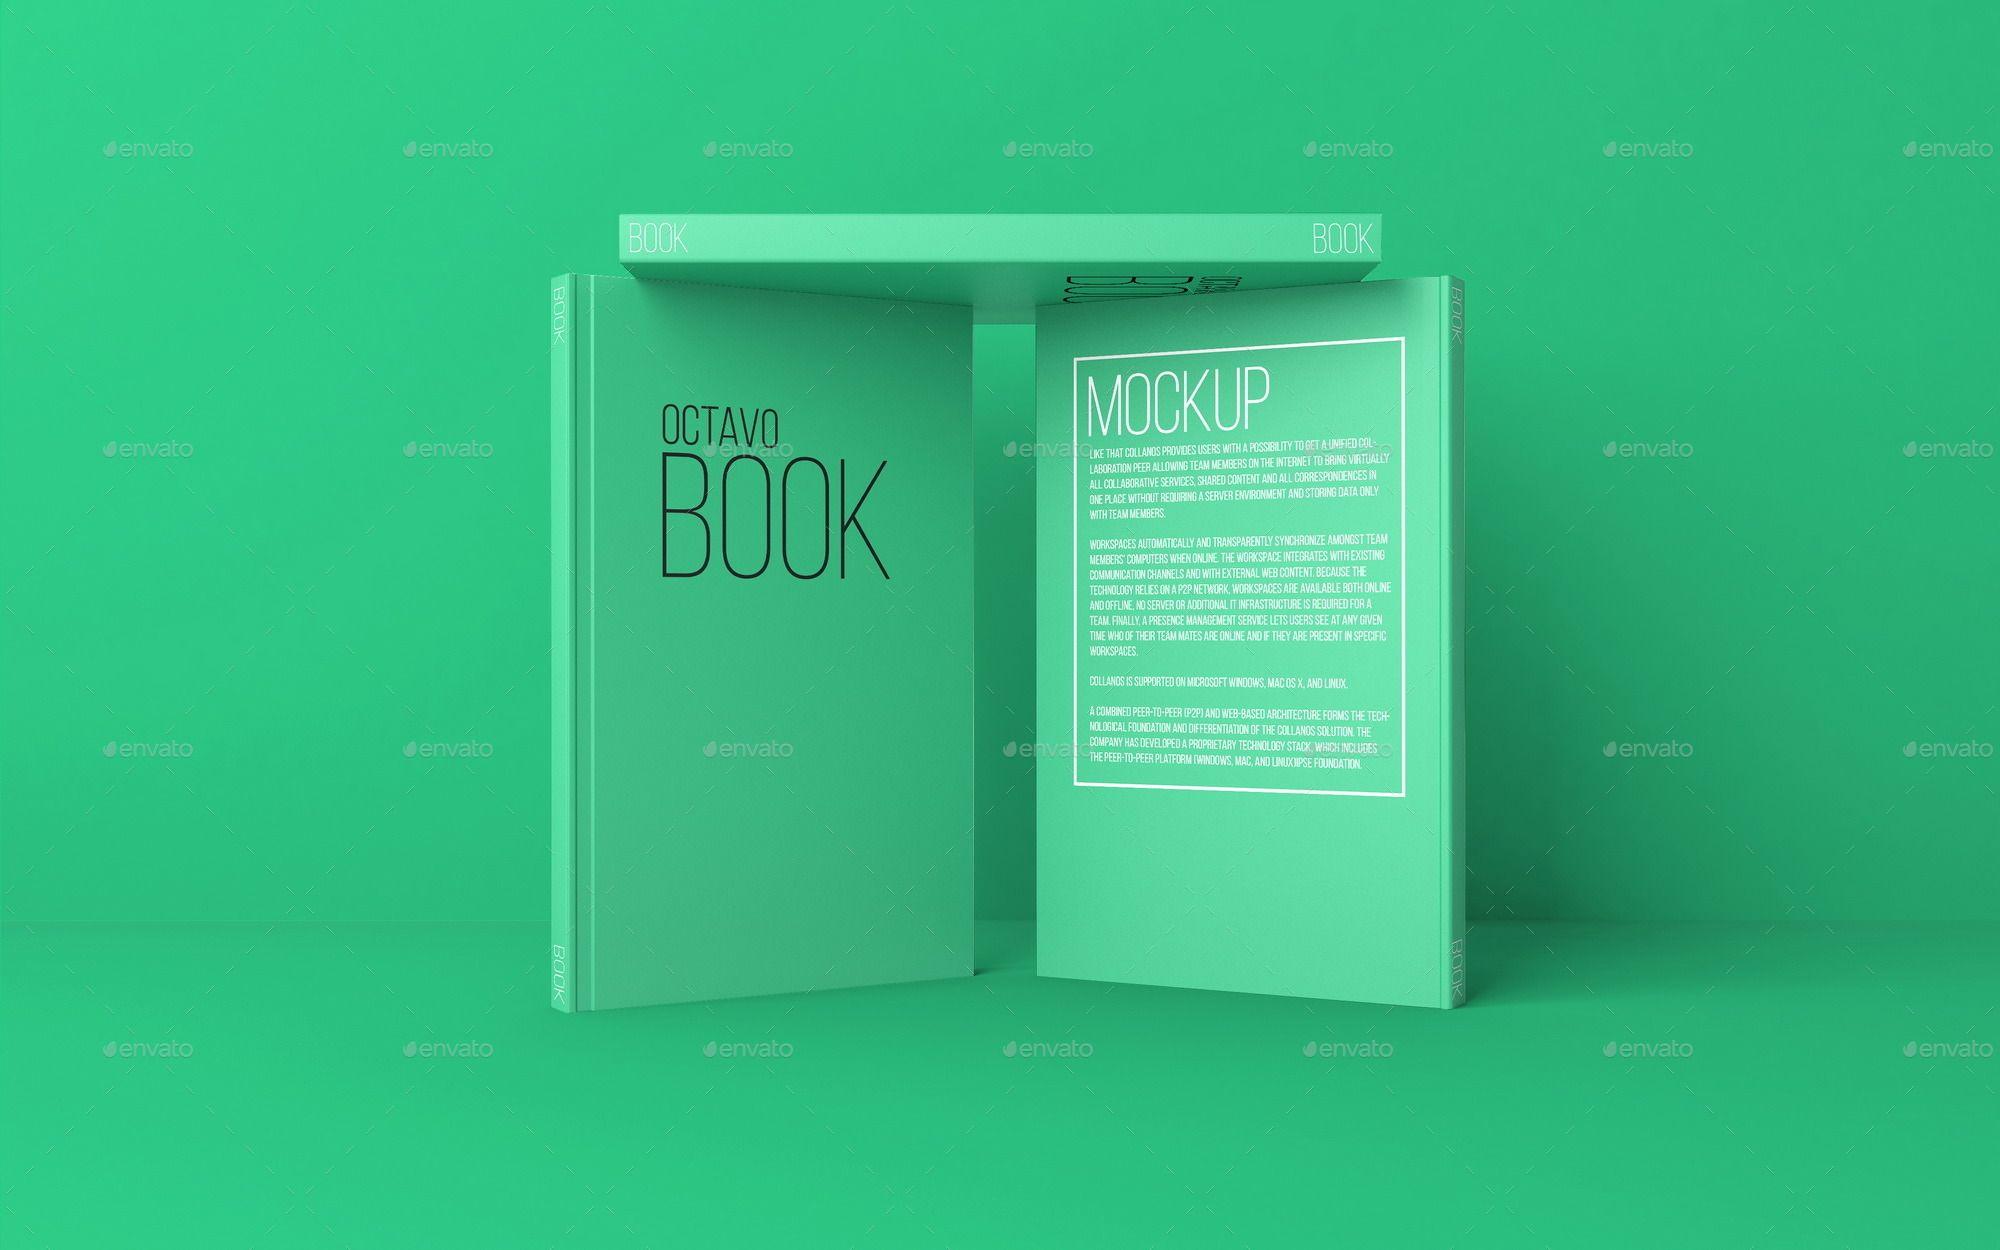 Octavo Book MockUp Set.1 Locker storage, Cover design